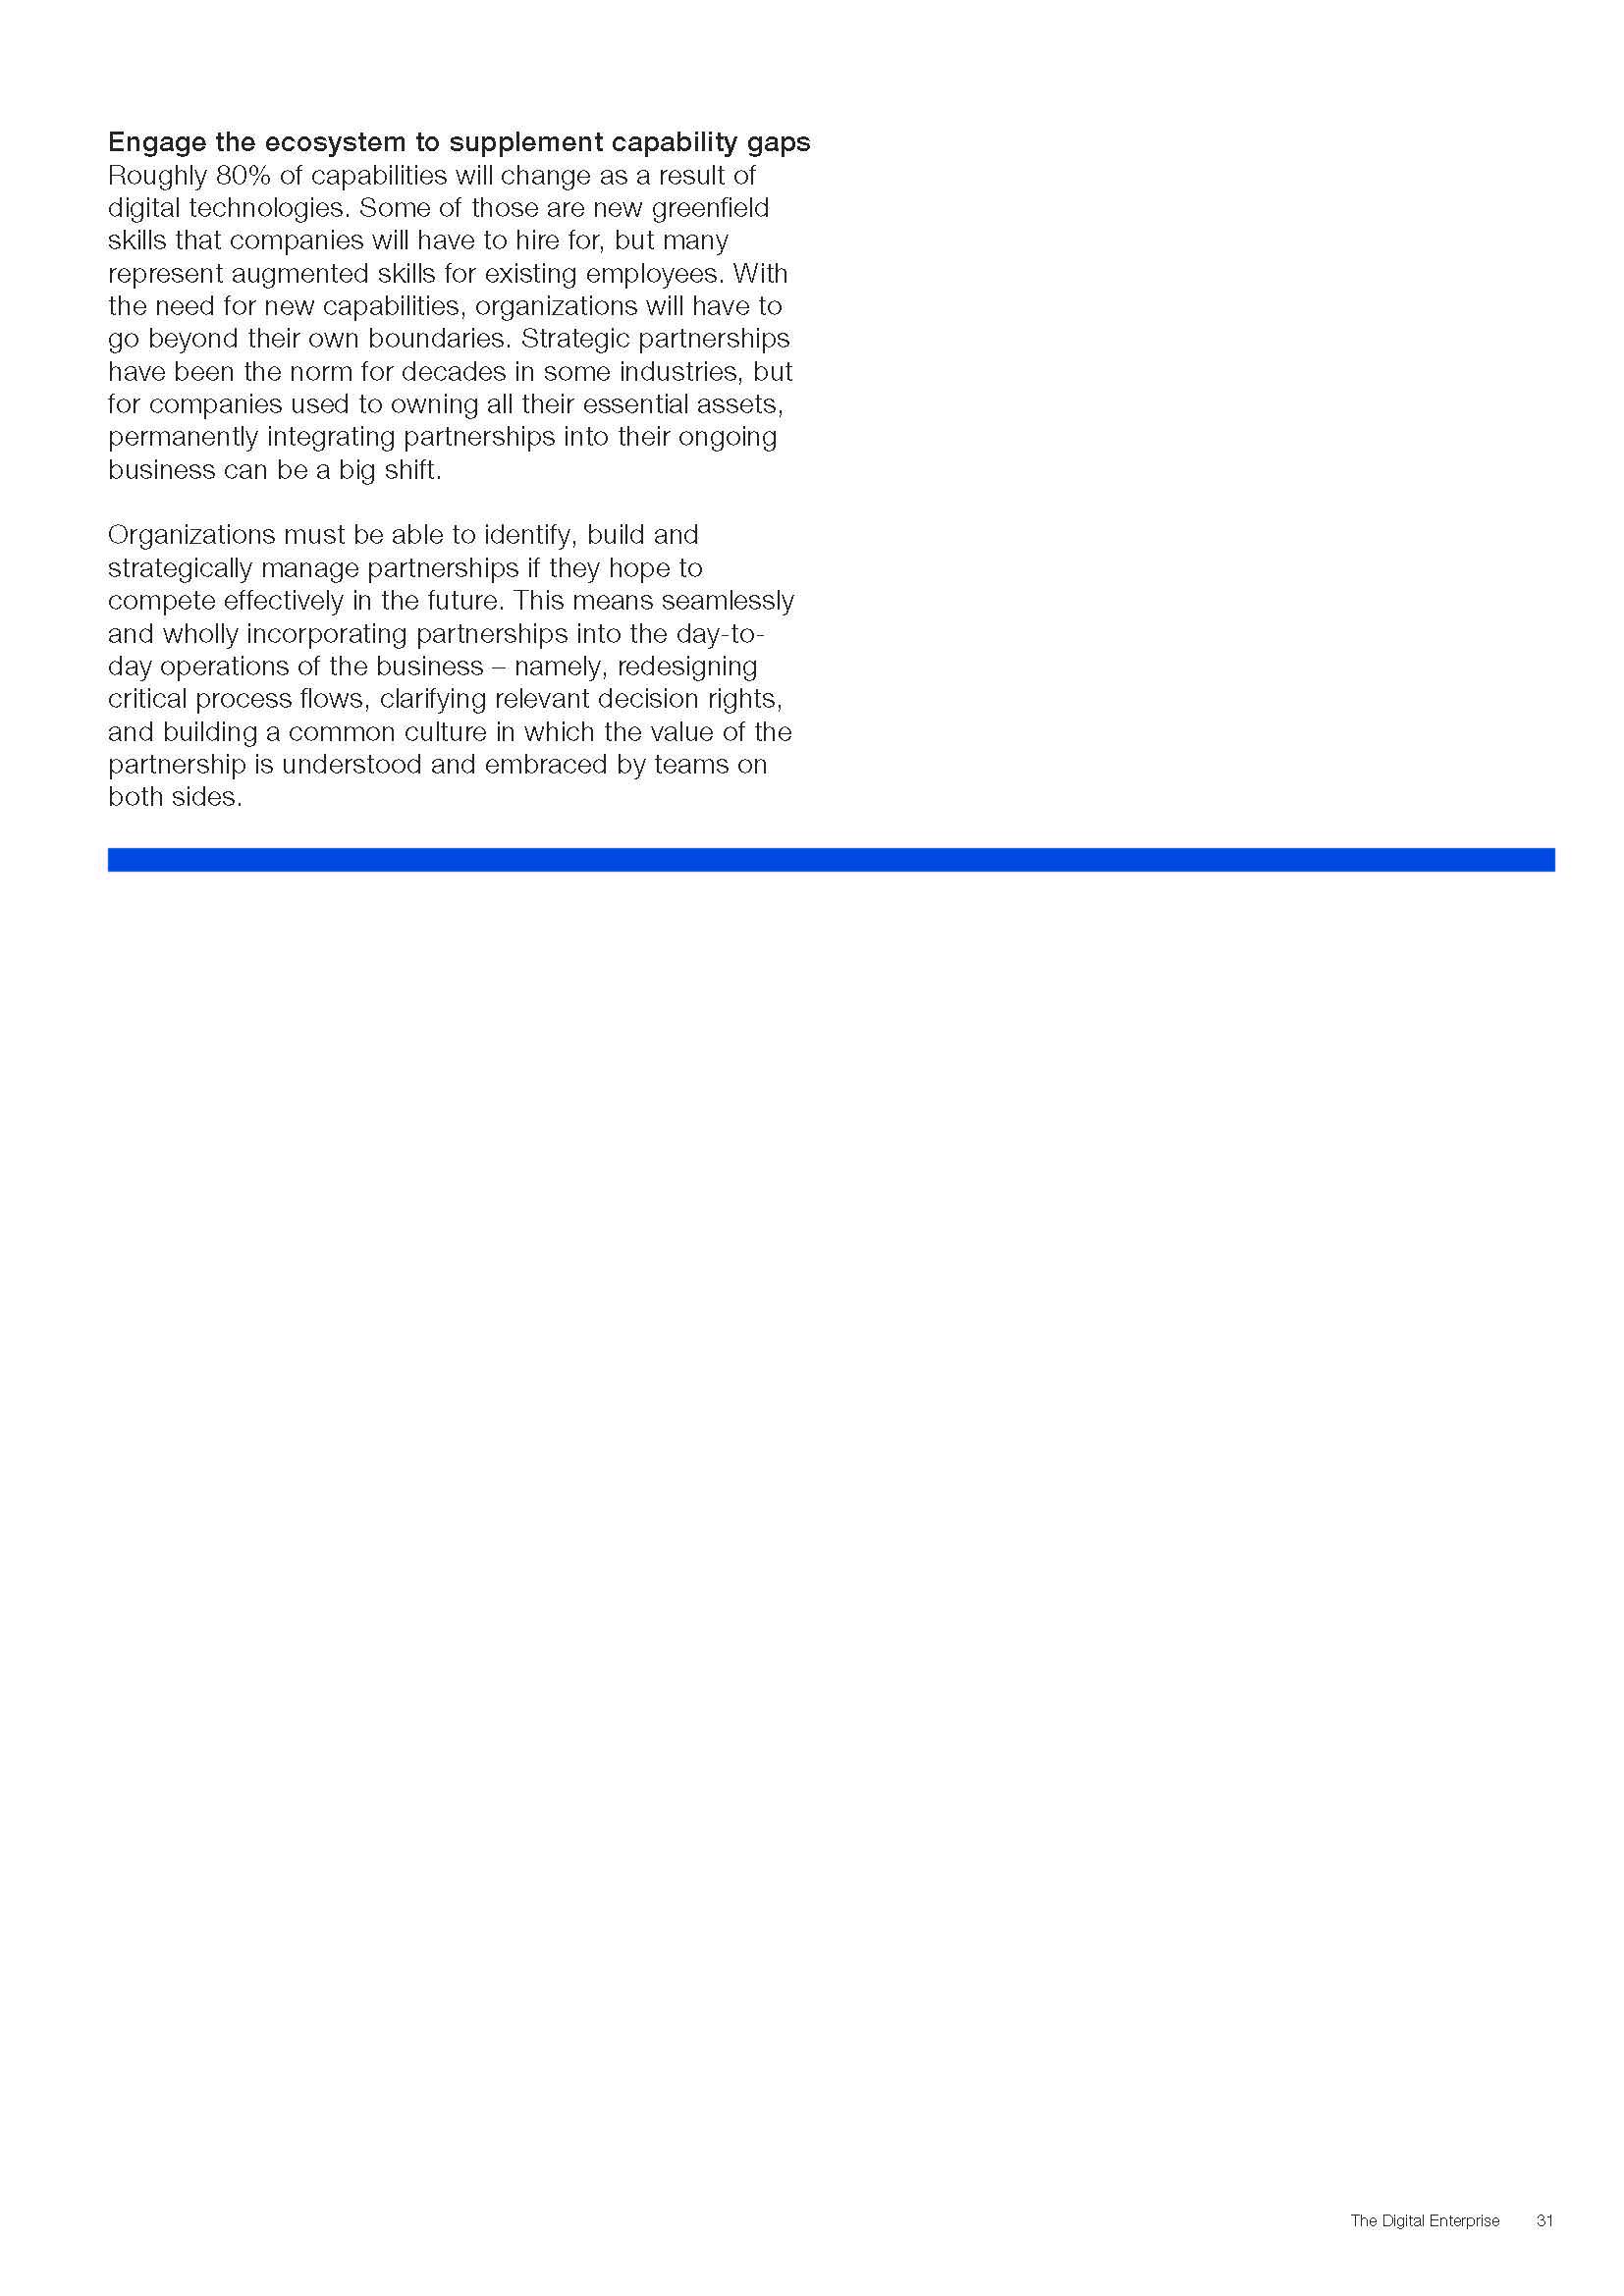 1_Page_31.jpg